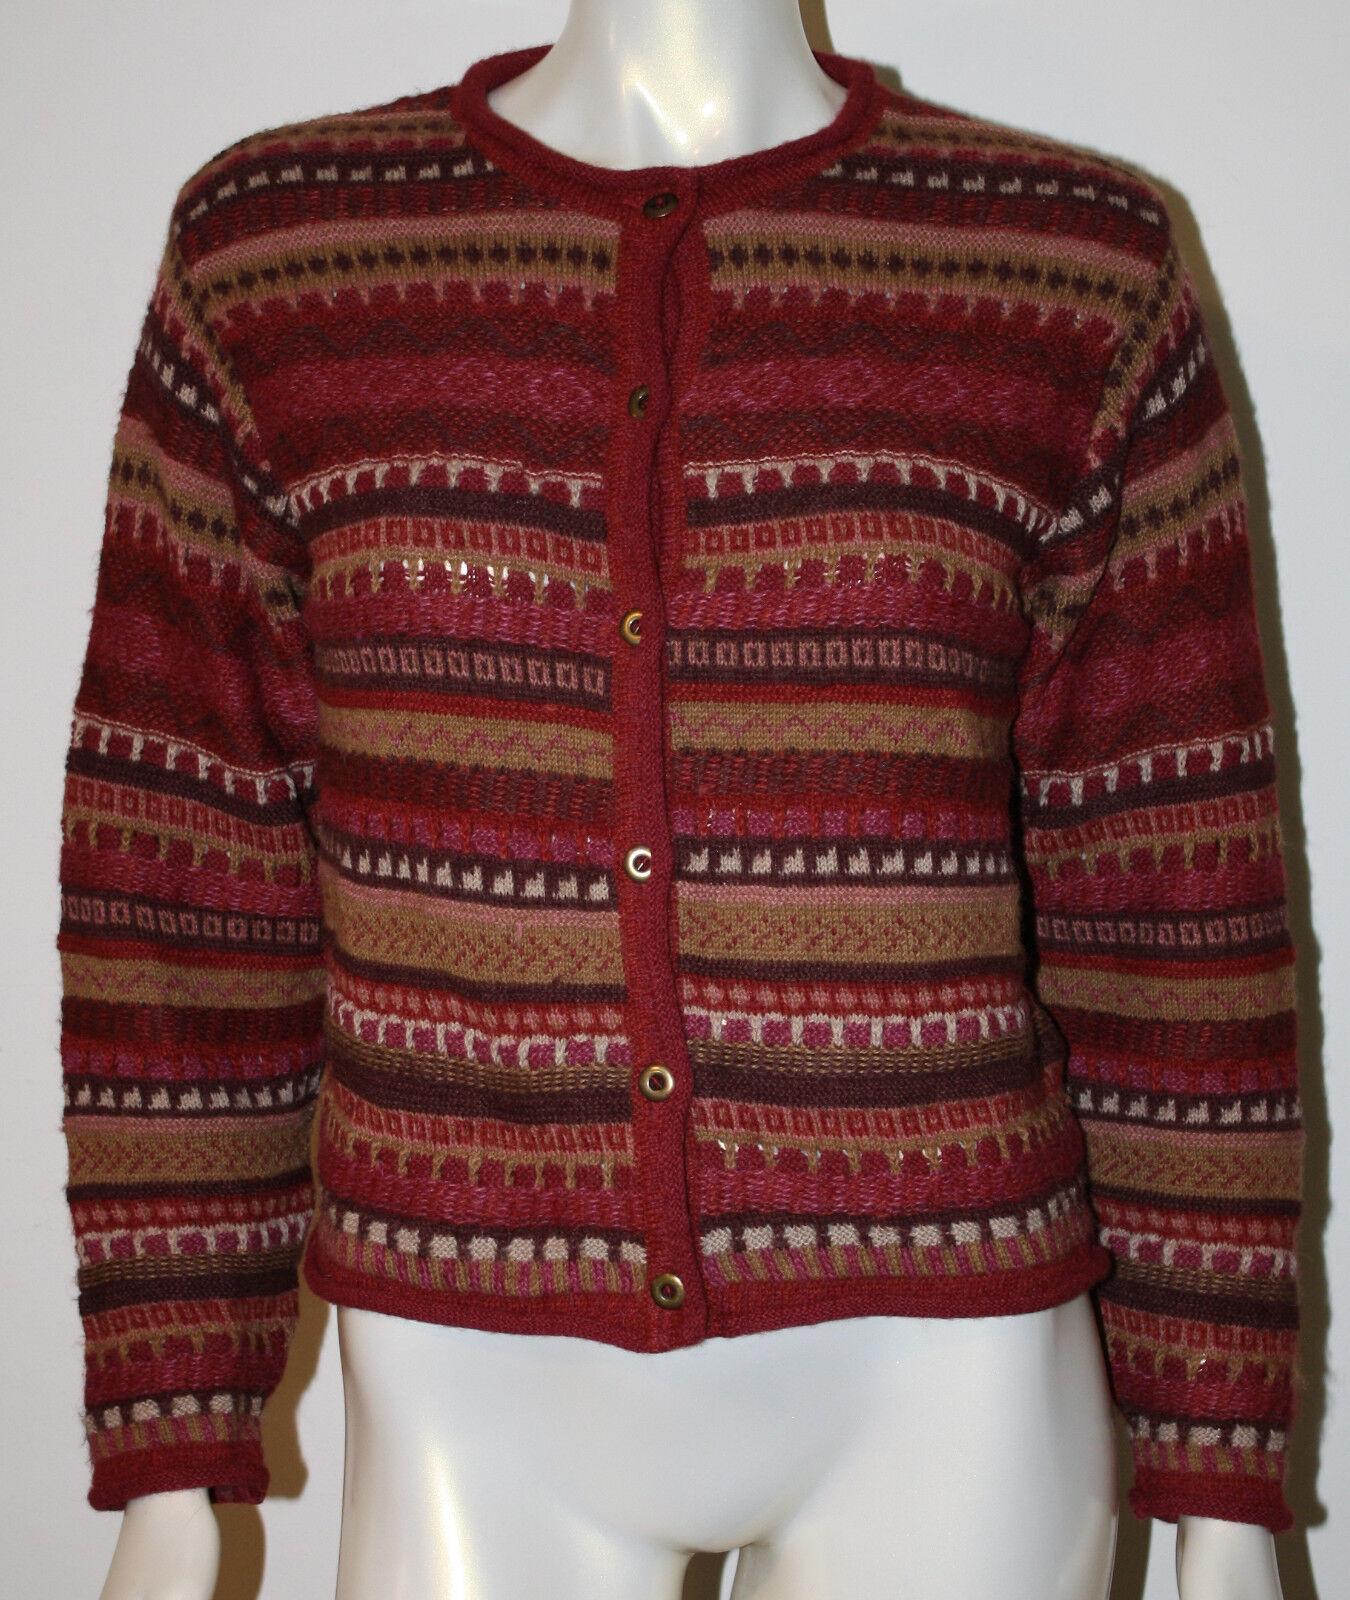 ALPACA 111 Pink Tan Geometric Weave Alpaca Wool Cardigan Sweater Peru M L